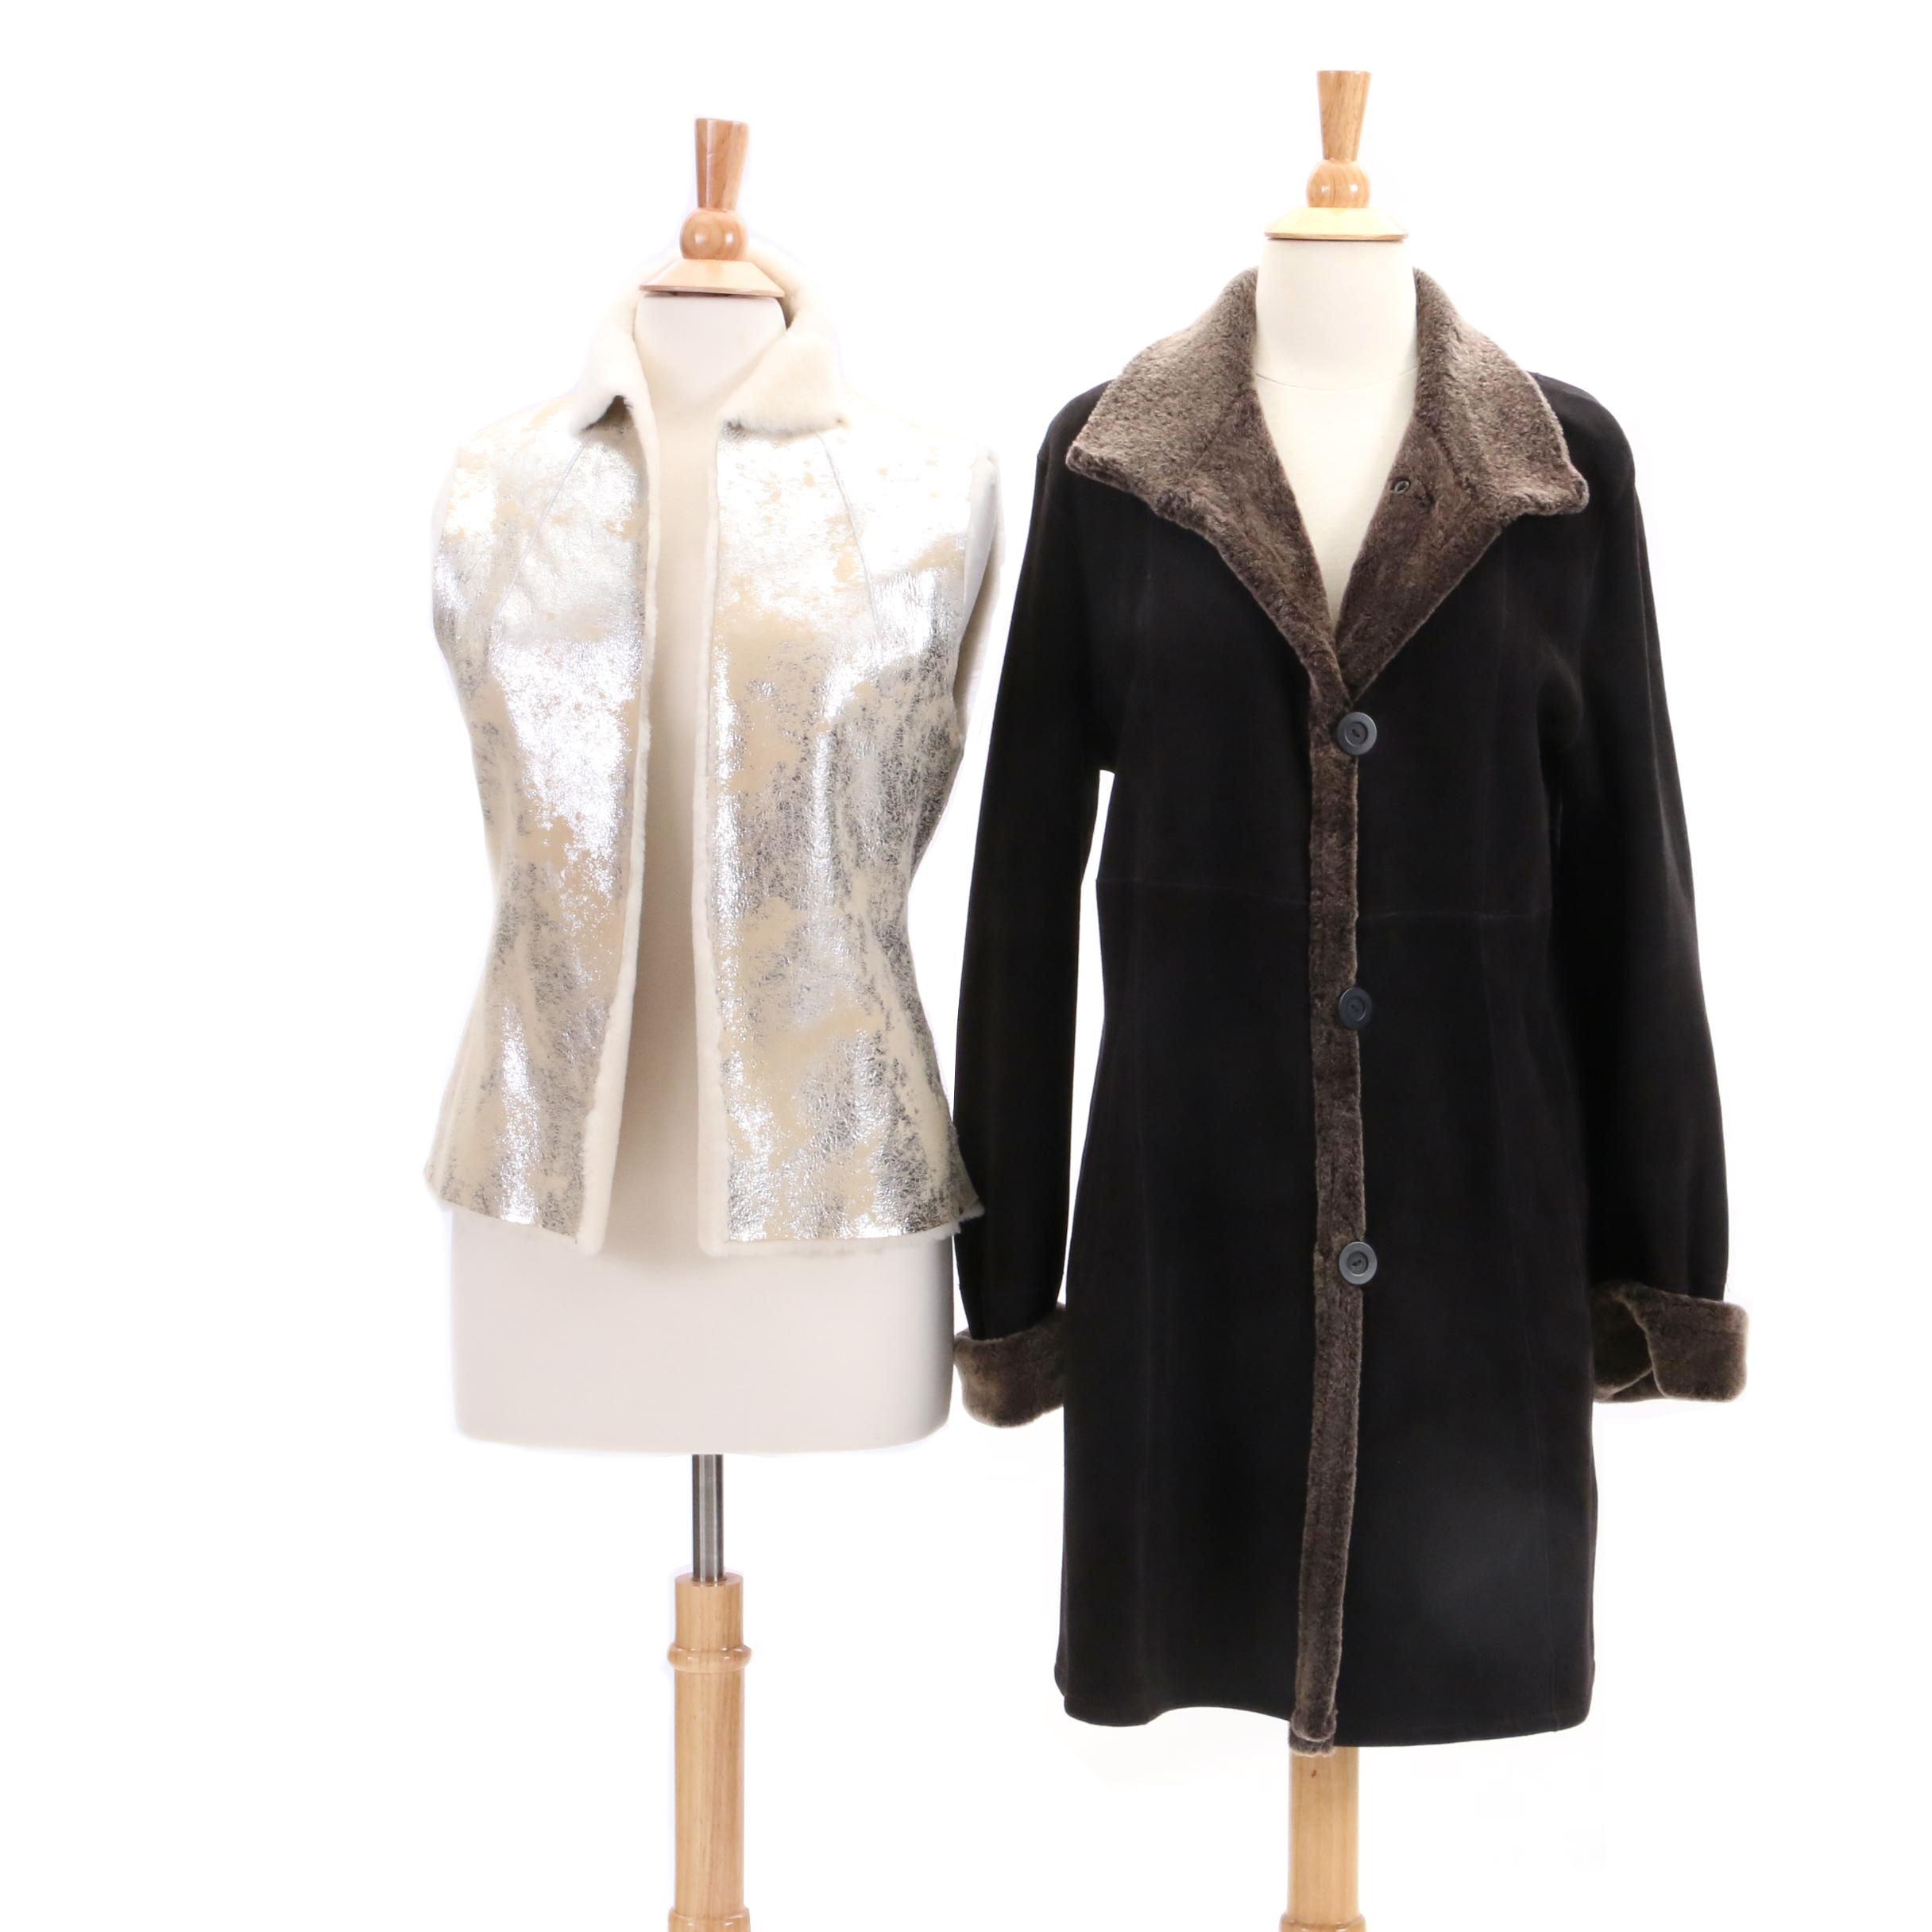 Tory Burch Shearling Vest and Blue Duck Sheepskin Coat